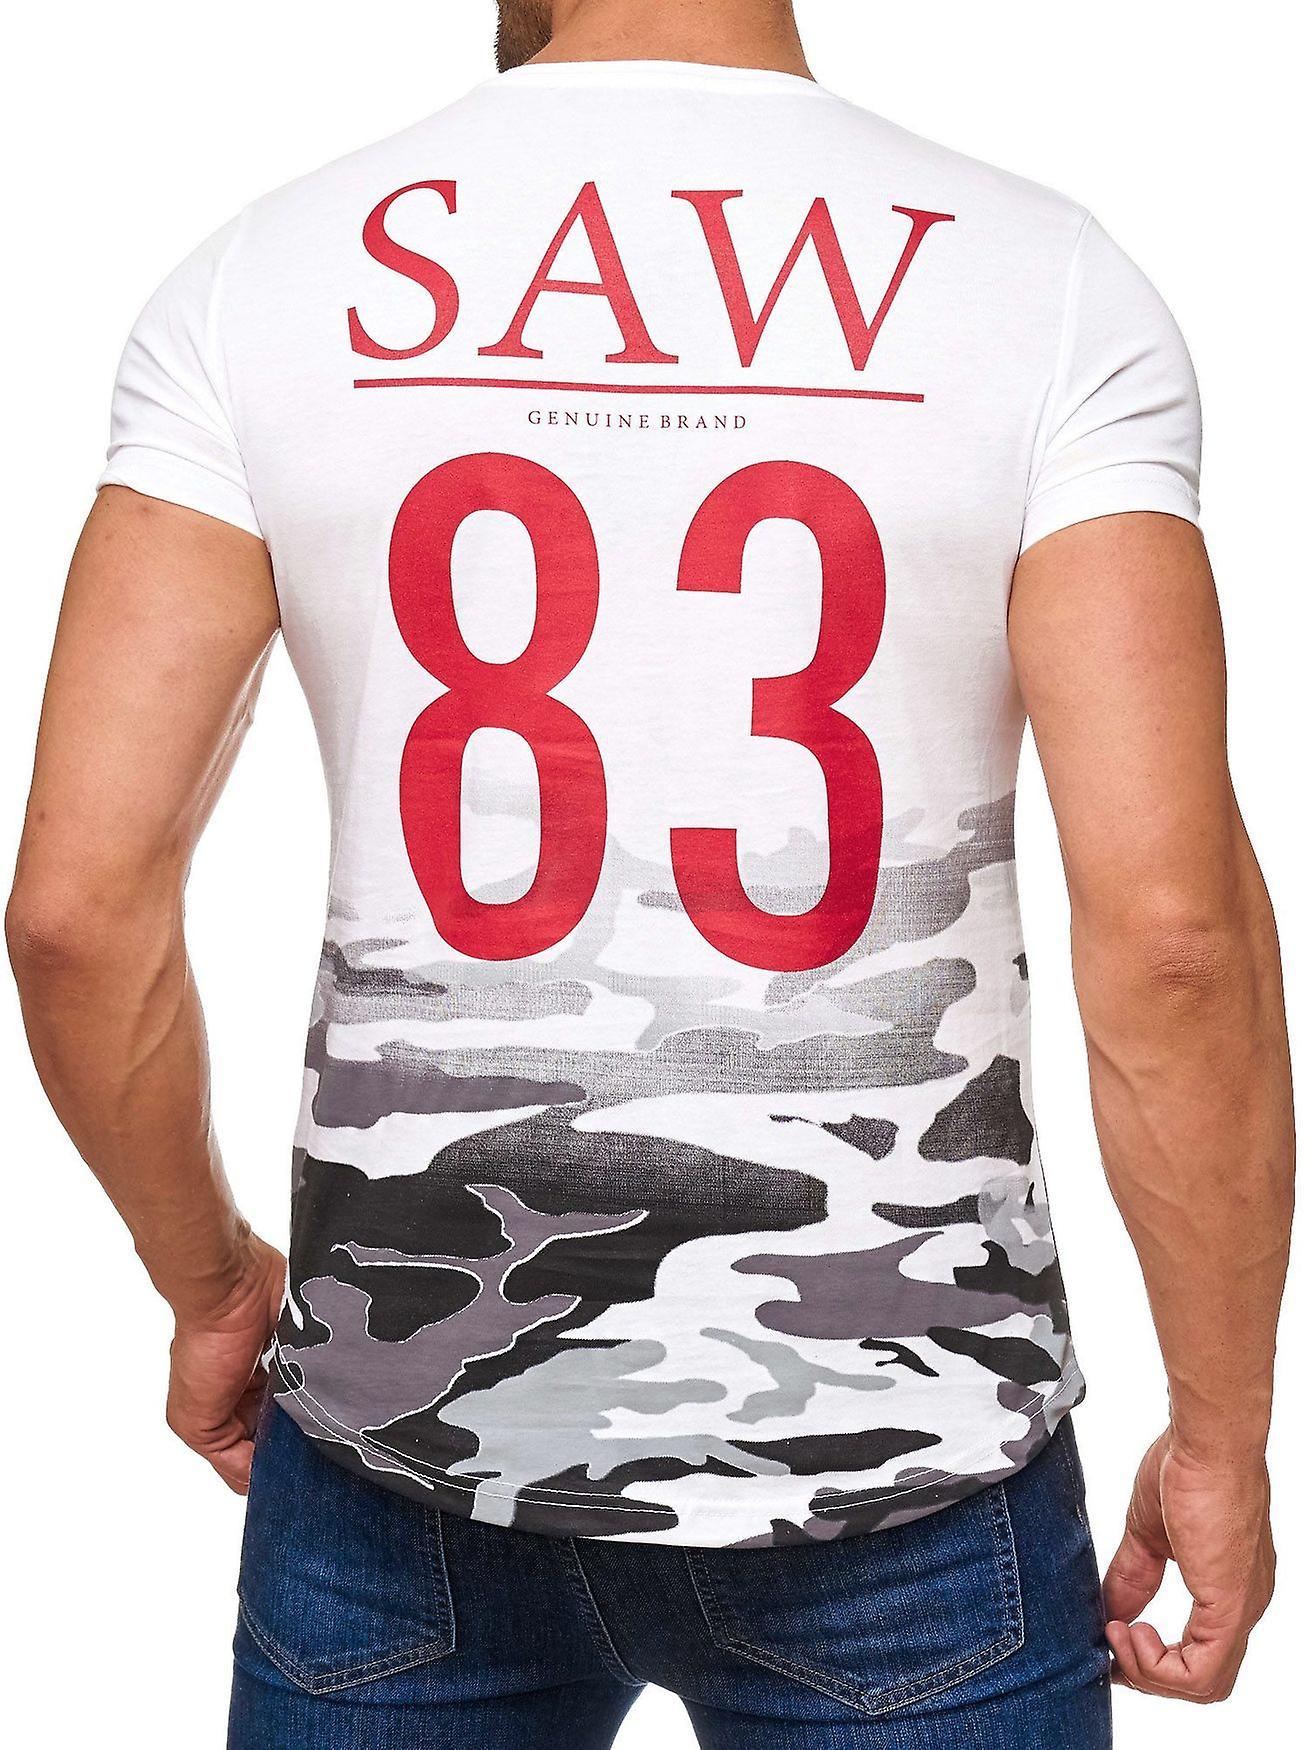 Herren T-Shirt Kurzarm Shirt O-Neck Allover Print Aufdruck Camouflage